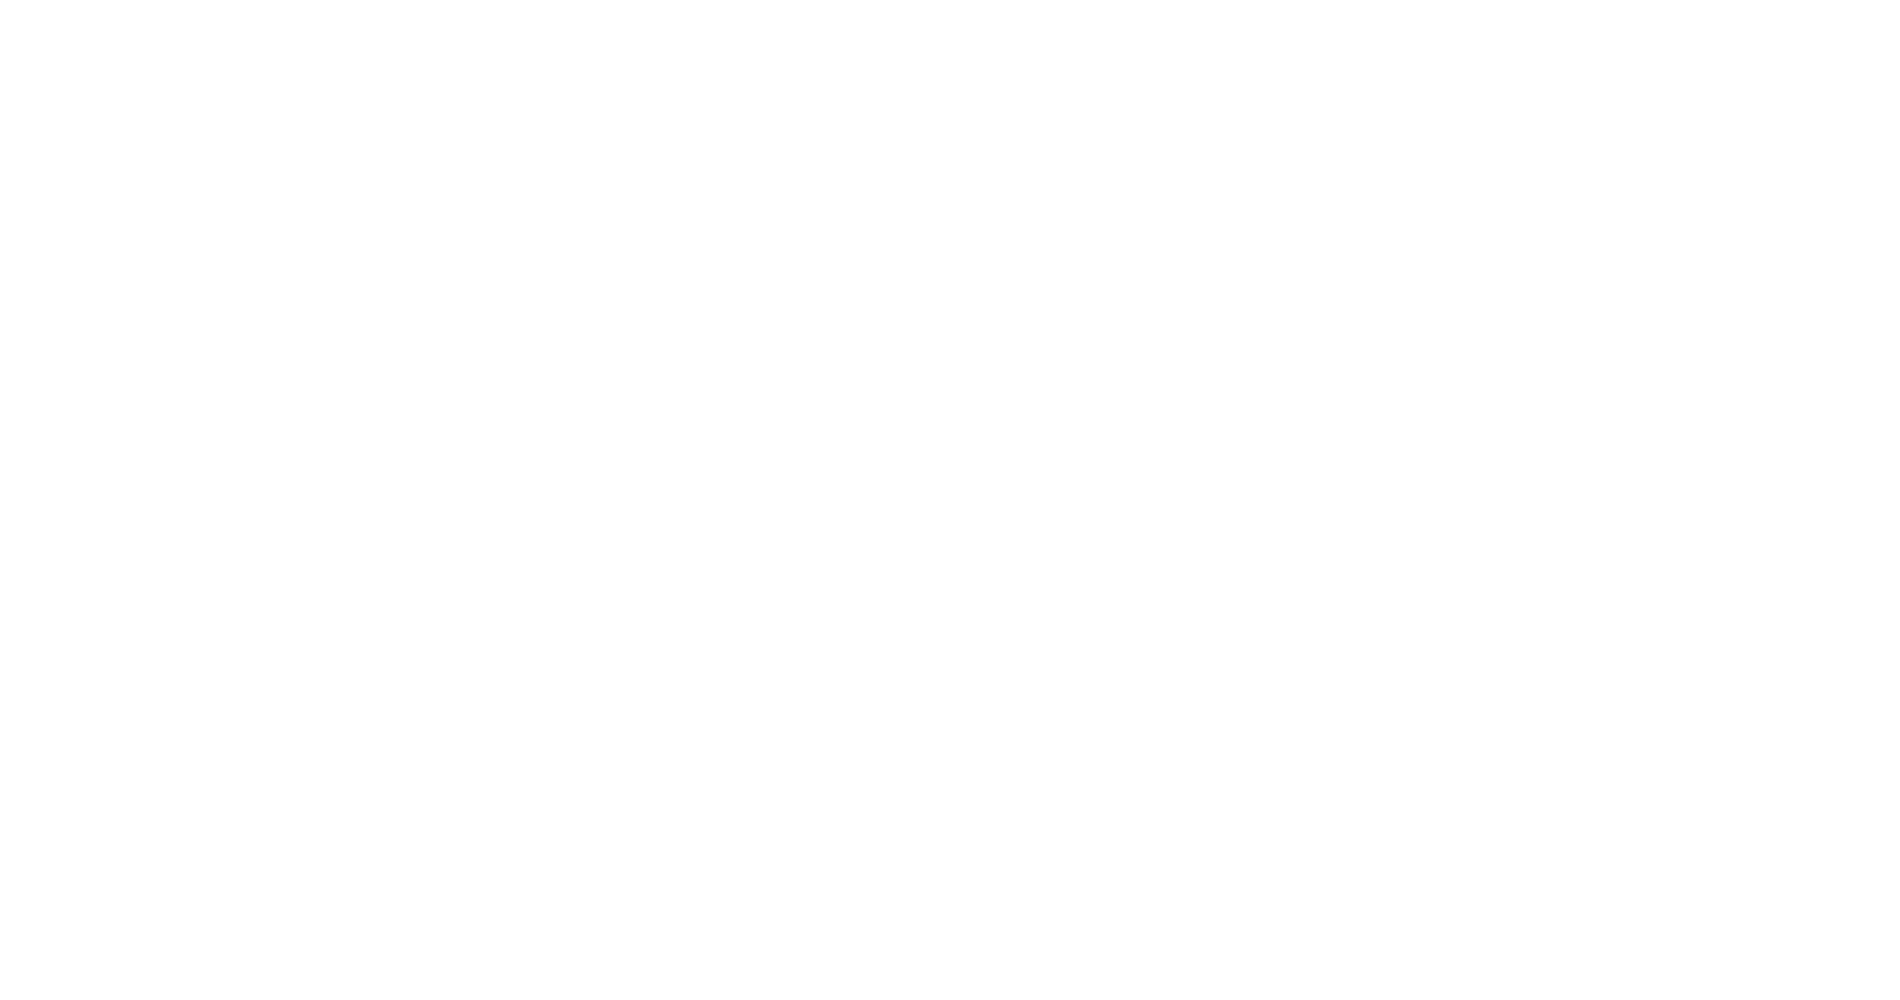 Yoobao B20 ถึกบึกบึน ดีไซน์แน่นหนา ความจุ 3000mAh พร้อมระบบชาร์จเร็ว